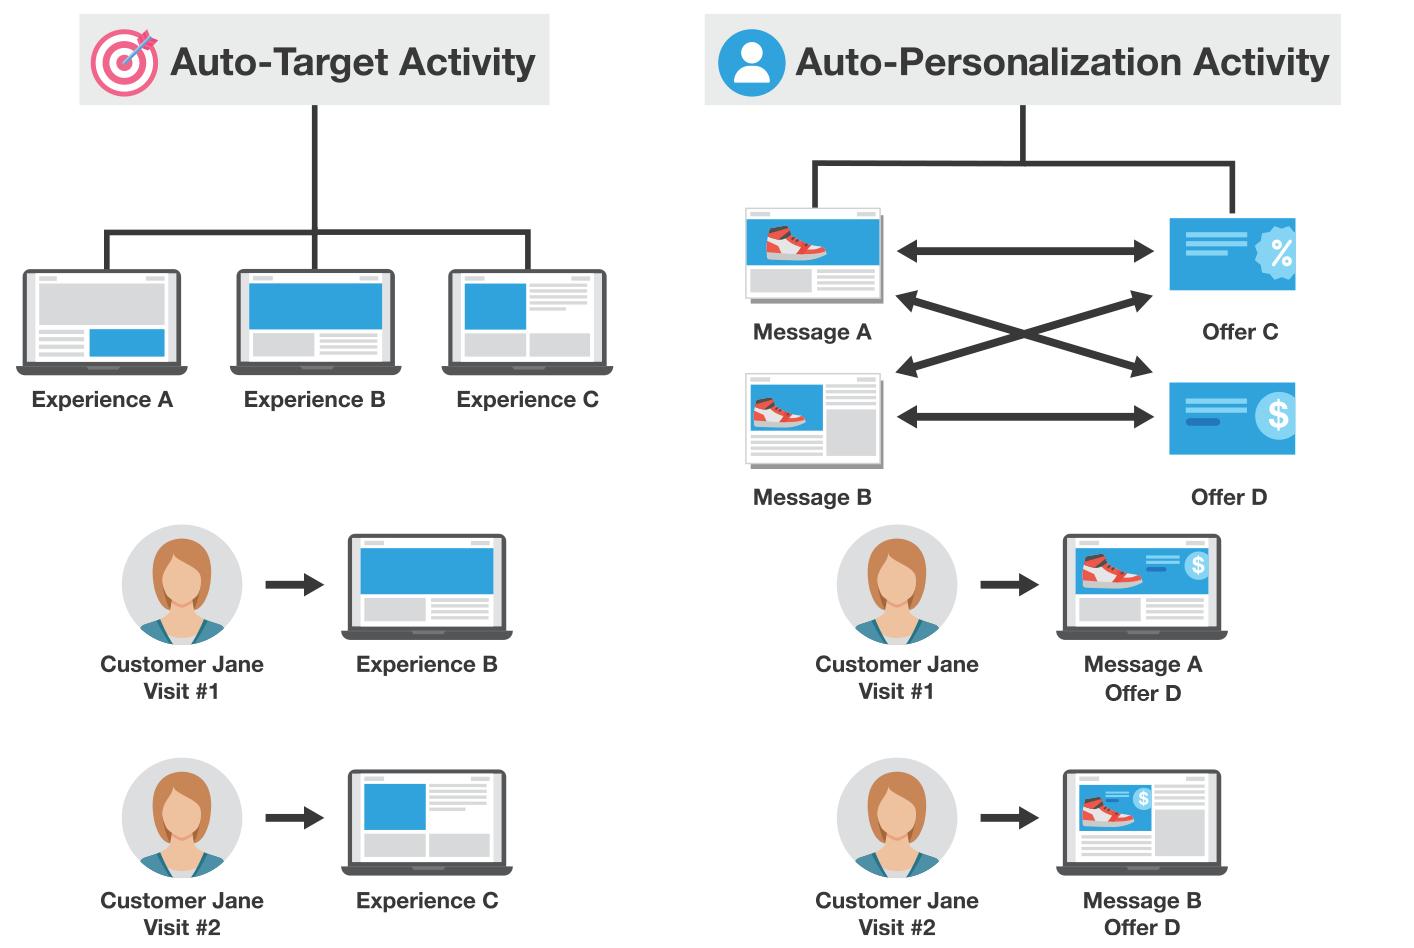 adobe target auto personalization auto target activity comparison